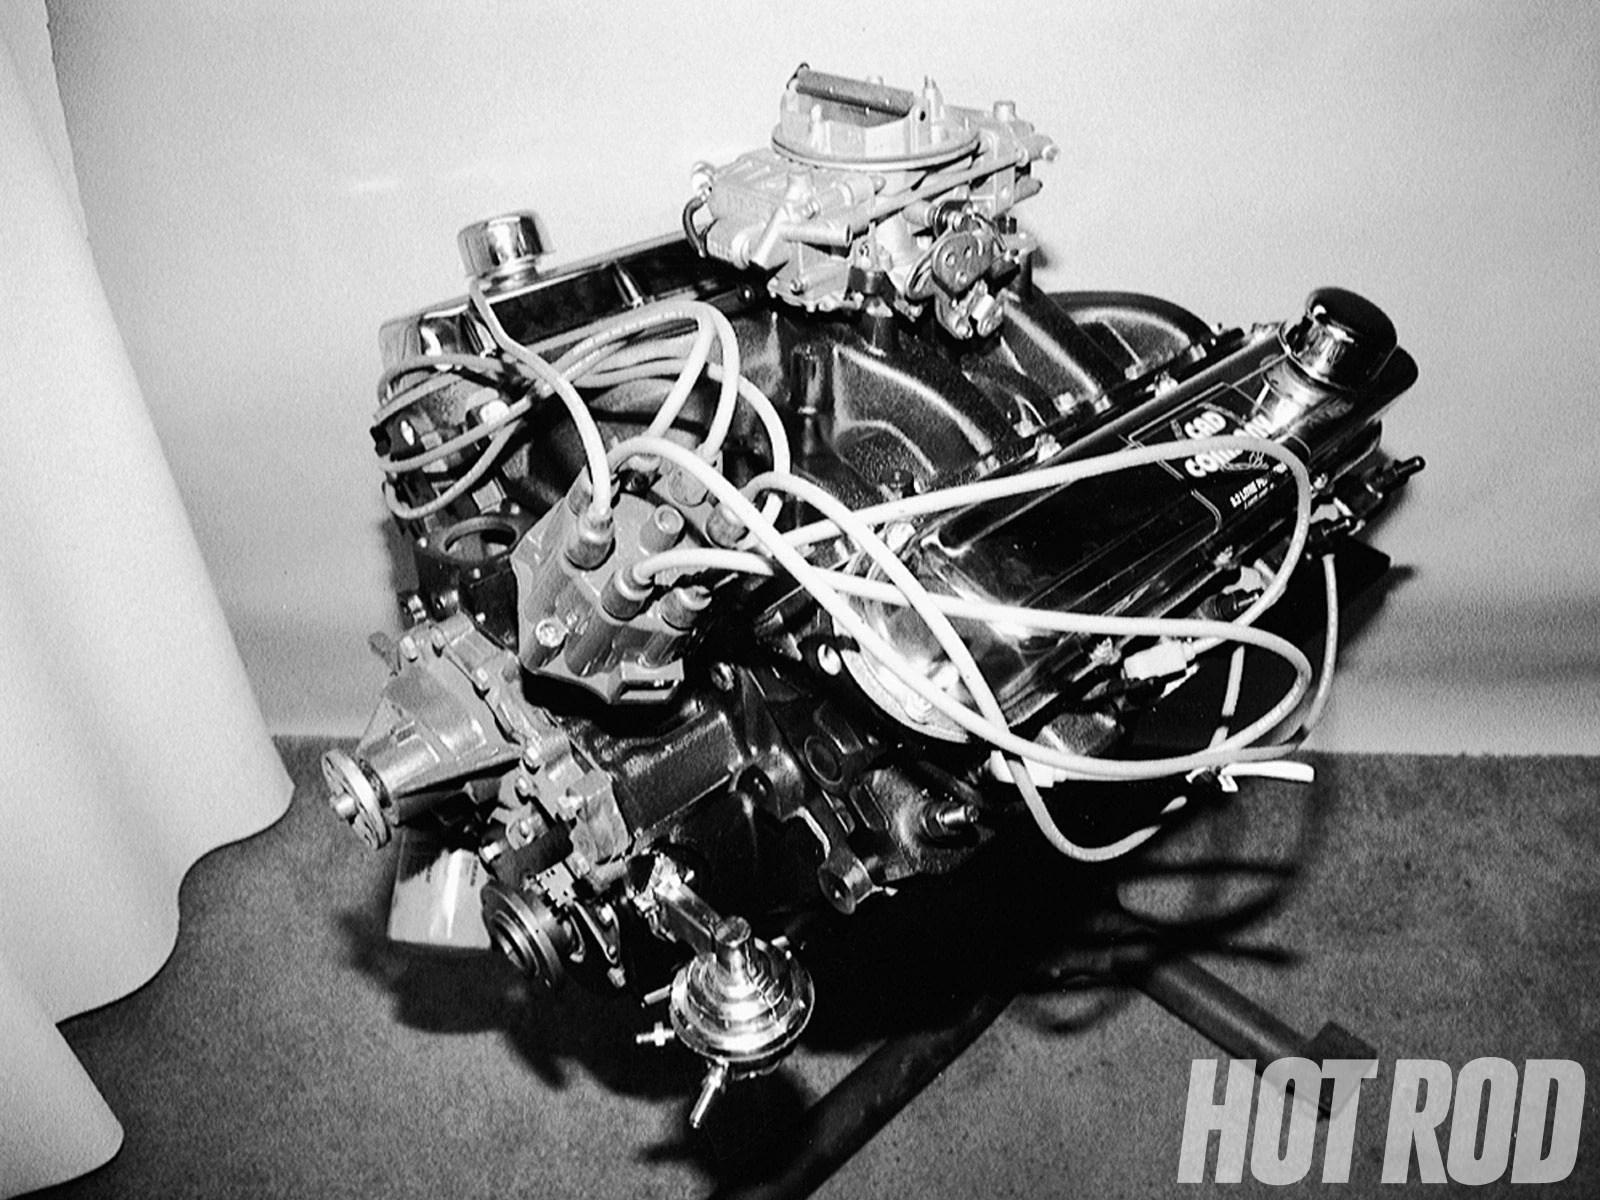 hight resolution of hrdp 9809 01 o 500ci cadillac big block engine build complete engine built